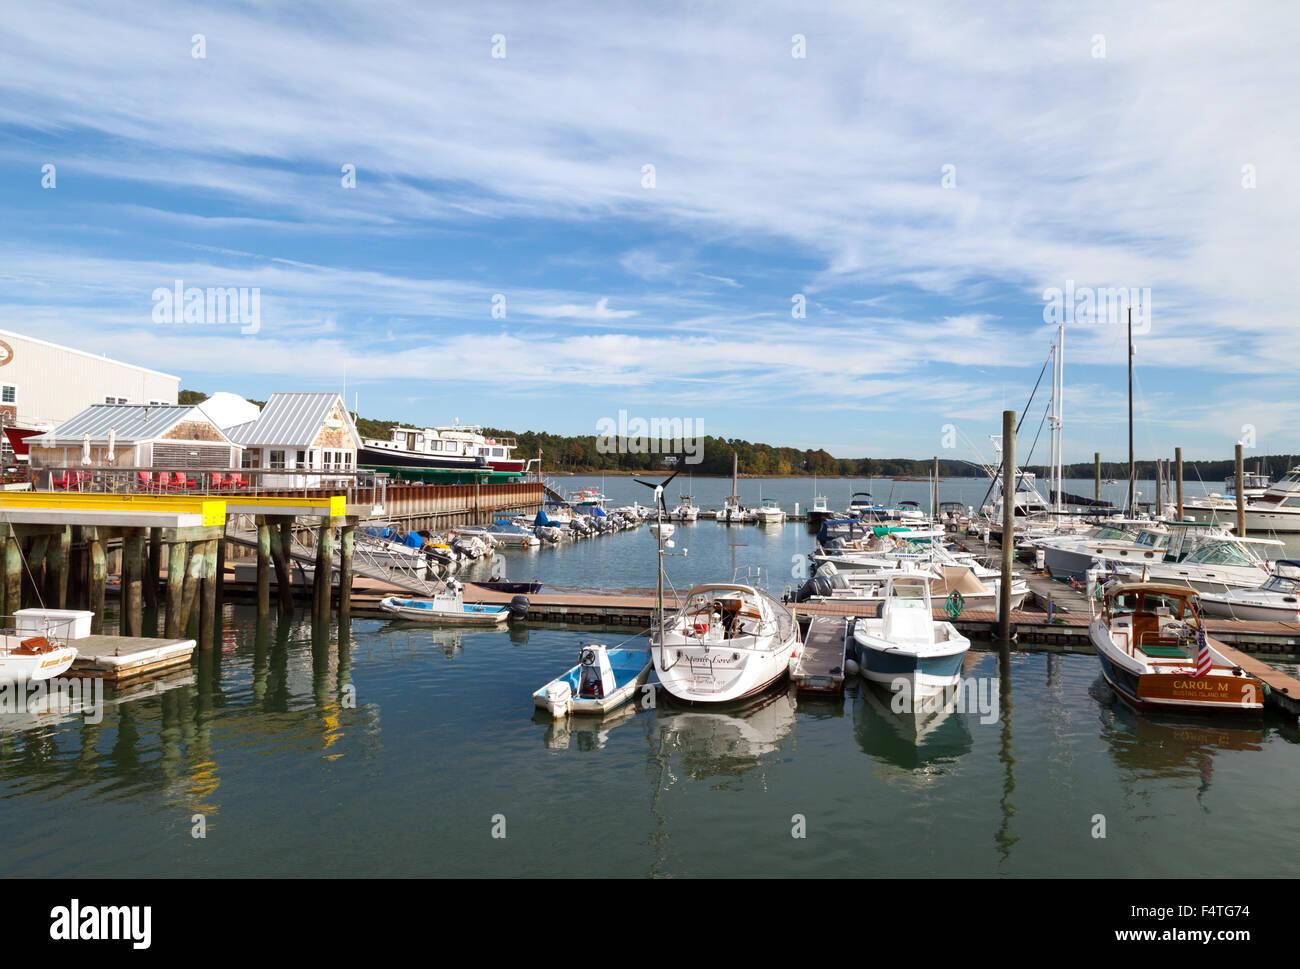 Freeport harbor on the Harraseeket River, Maine coast, USA - Stock Image